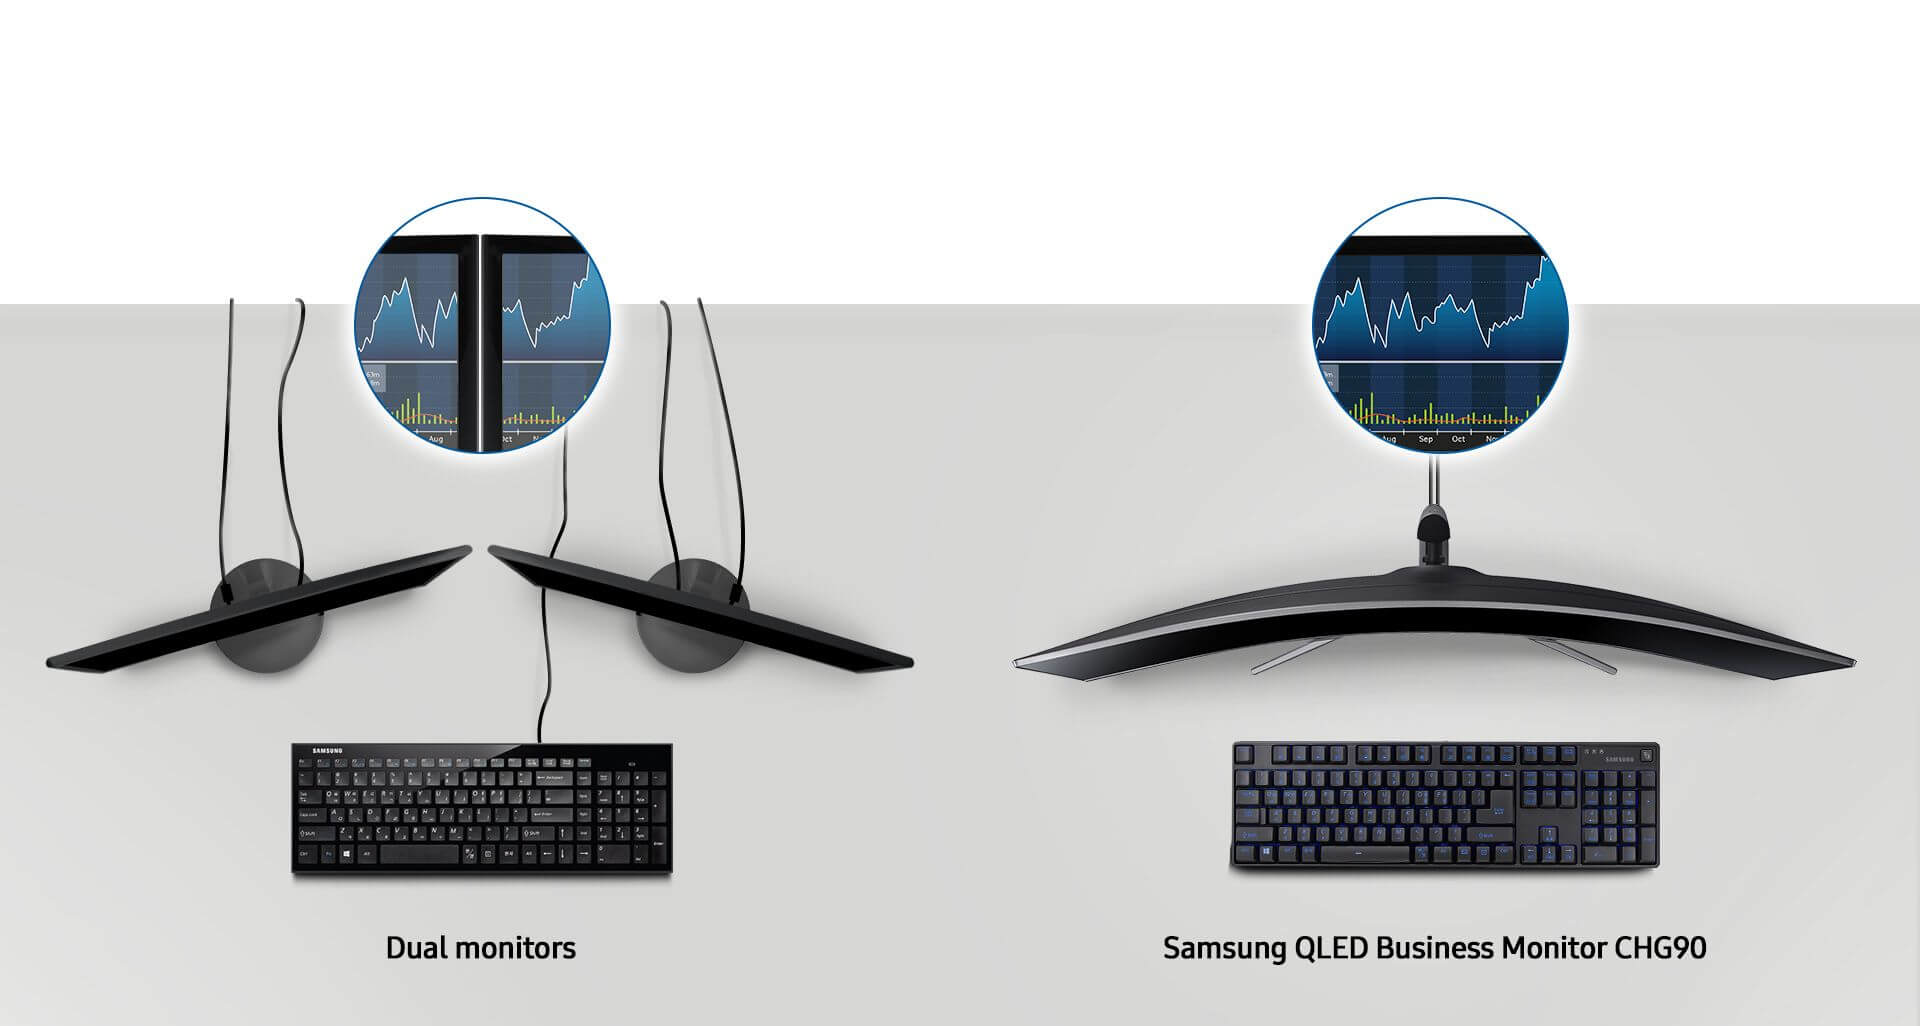 Dual monitor inconvenience